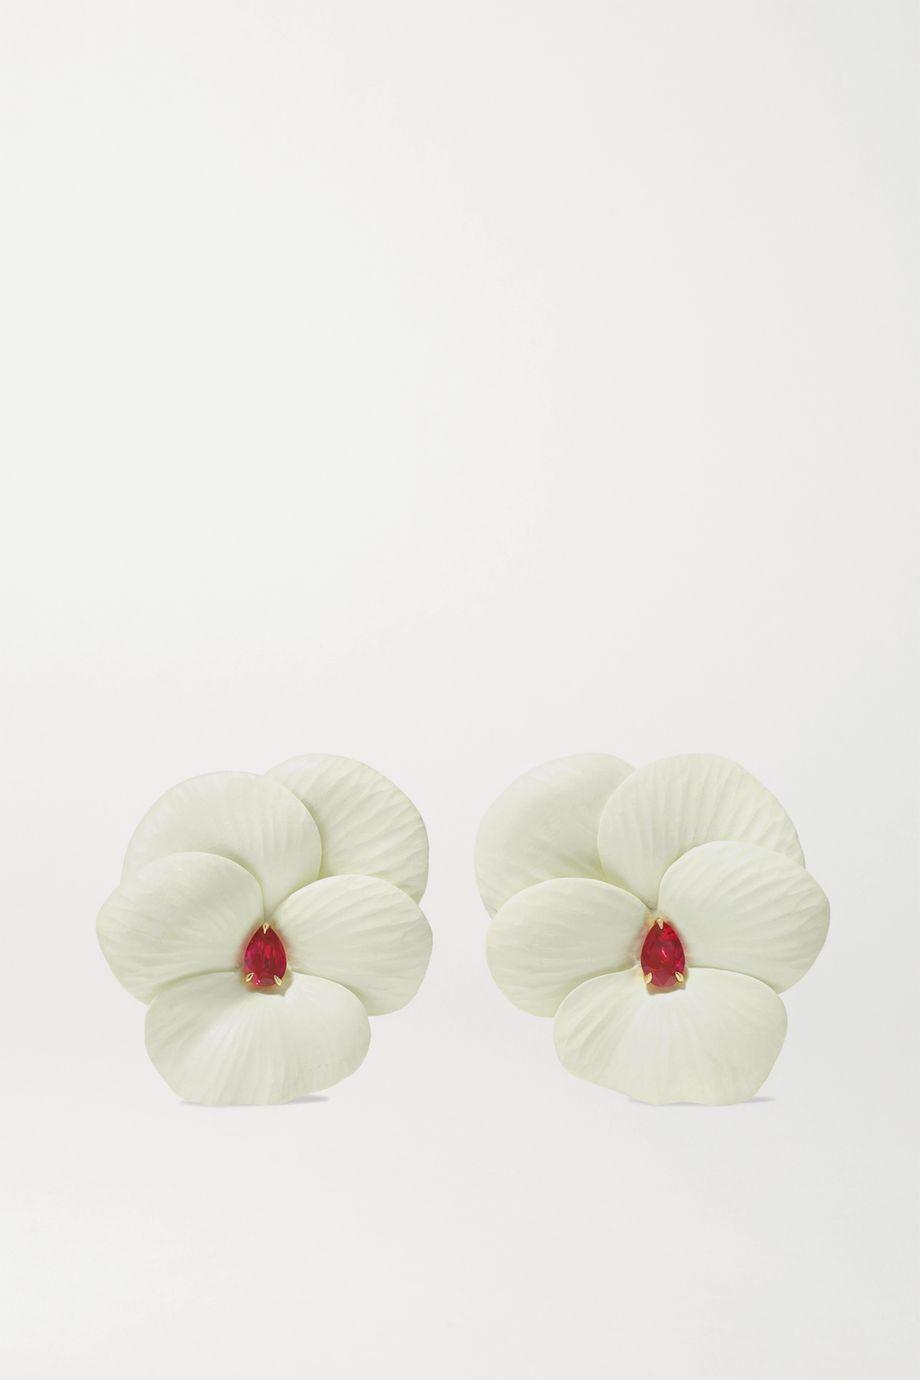 G by Glenn Spiro Luma HyCeram Luminex, 18-karat rose gold and ruby earrings